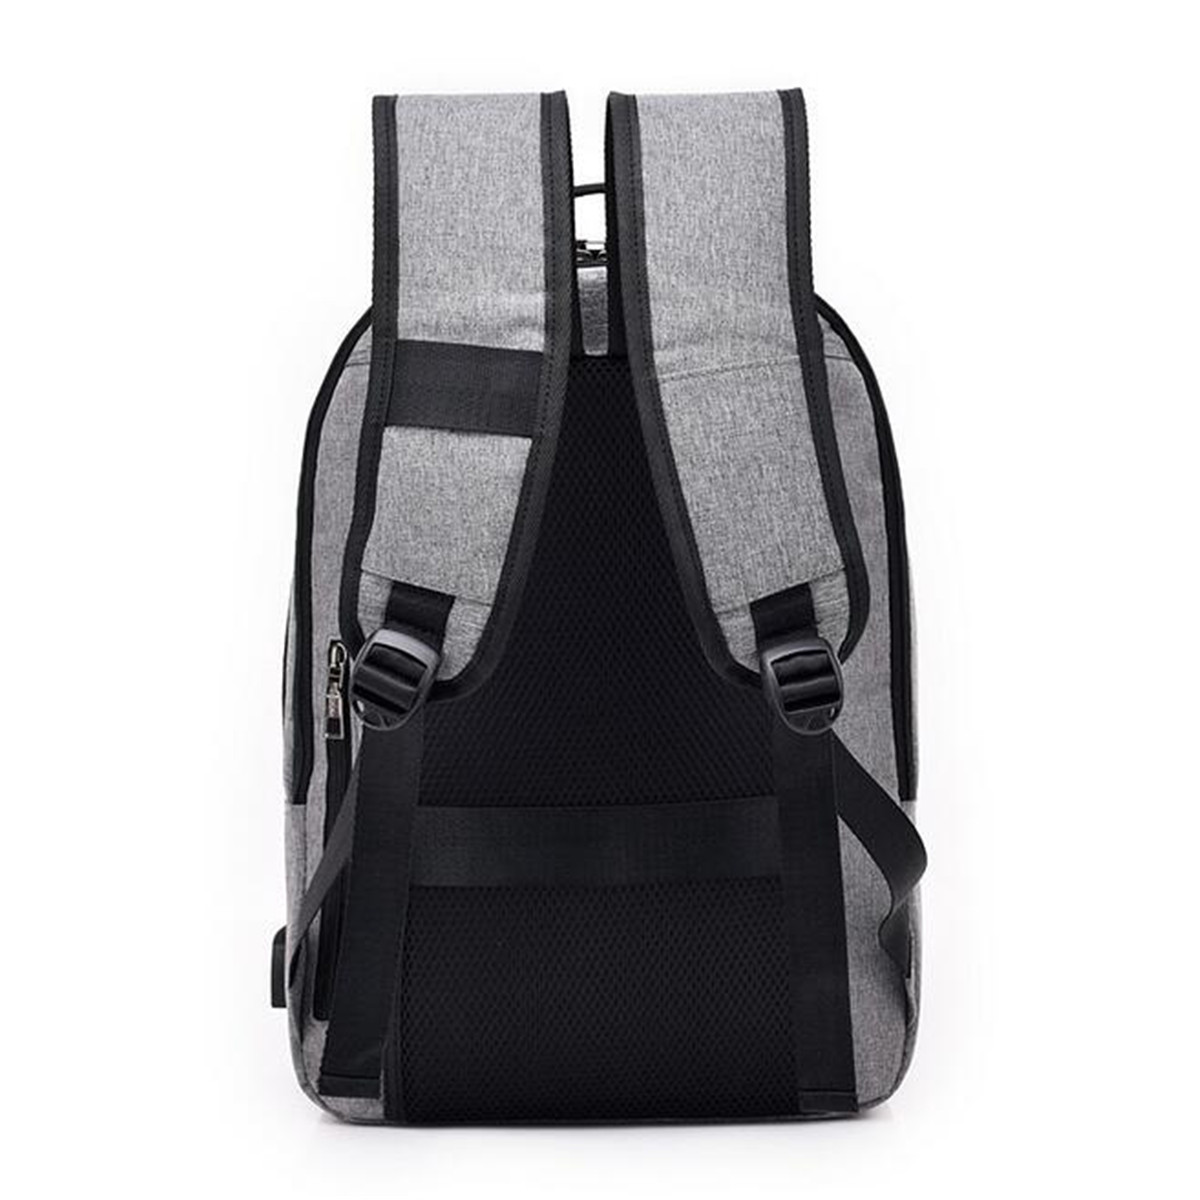 Anti-theft Men Women Laptop Notebook Backpack USB Charging Port Lock Travel School Bag